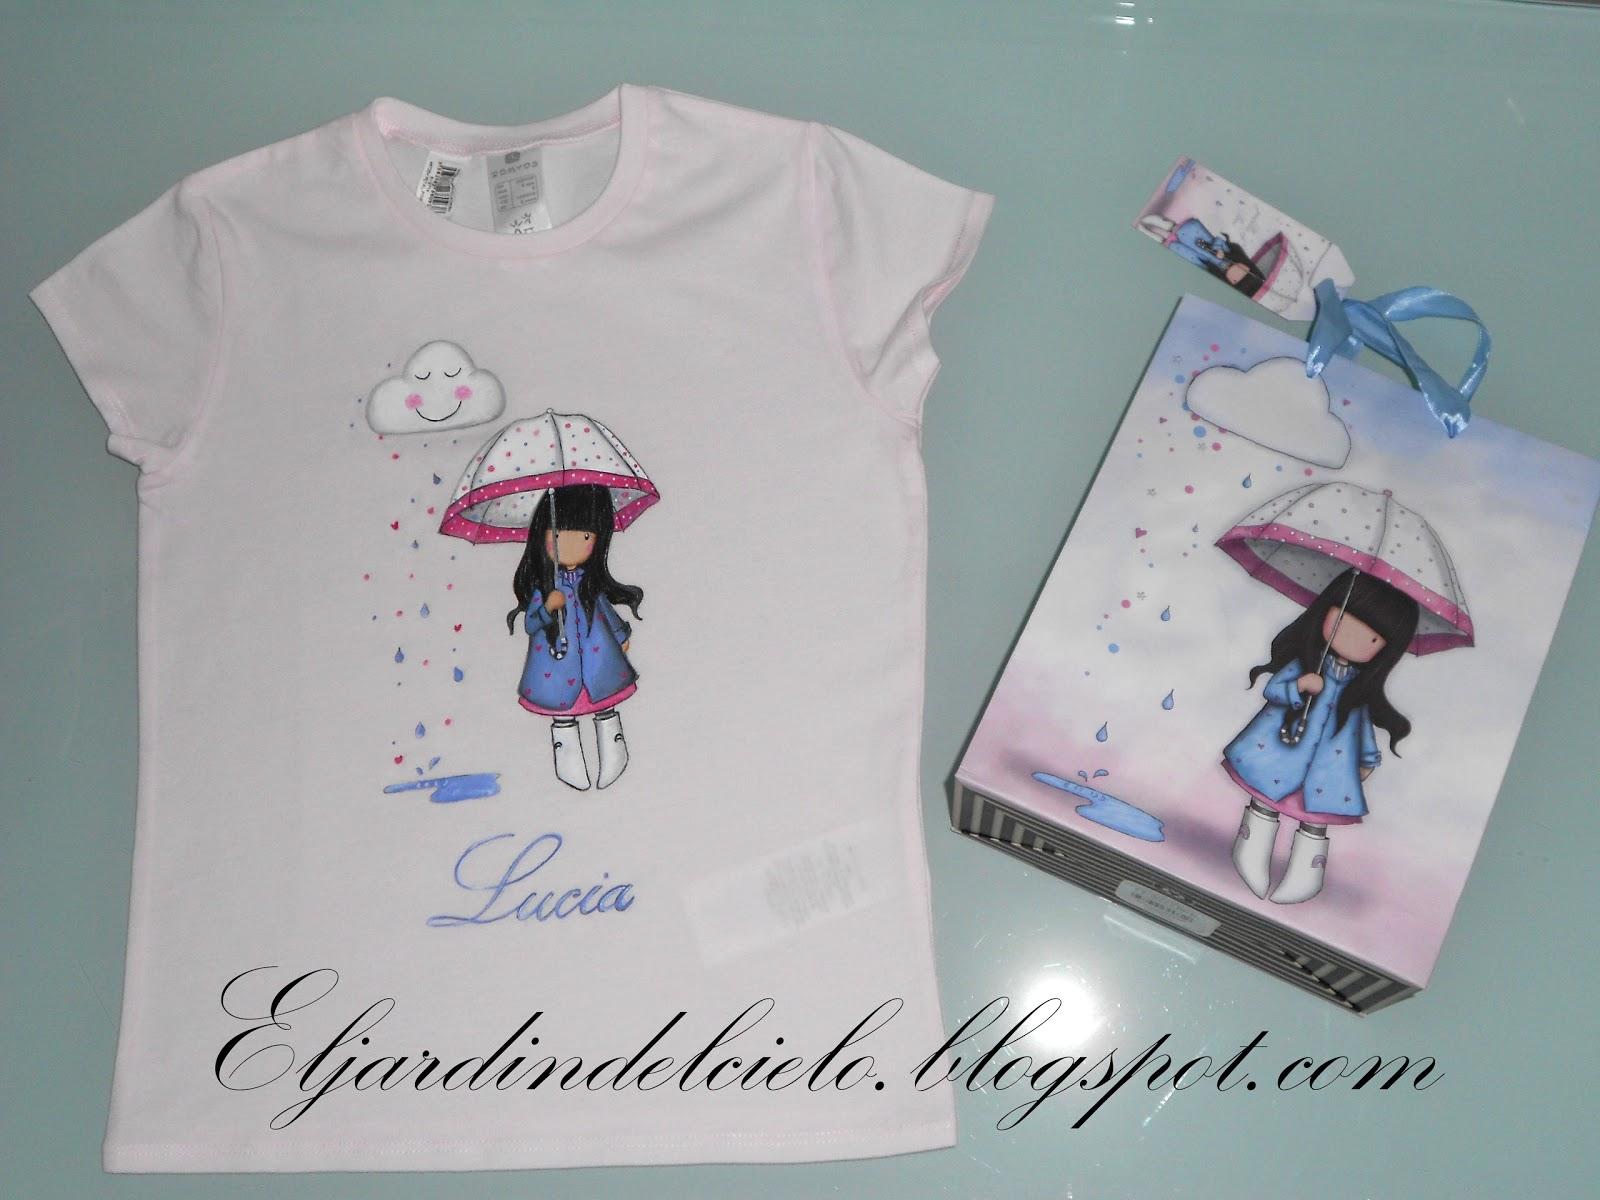 El jard n del cielo camiseta gorjus - Dibujos para pintar camisetas infantiles ...